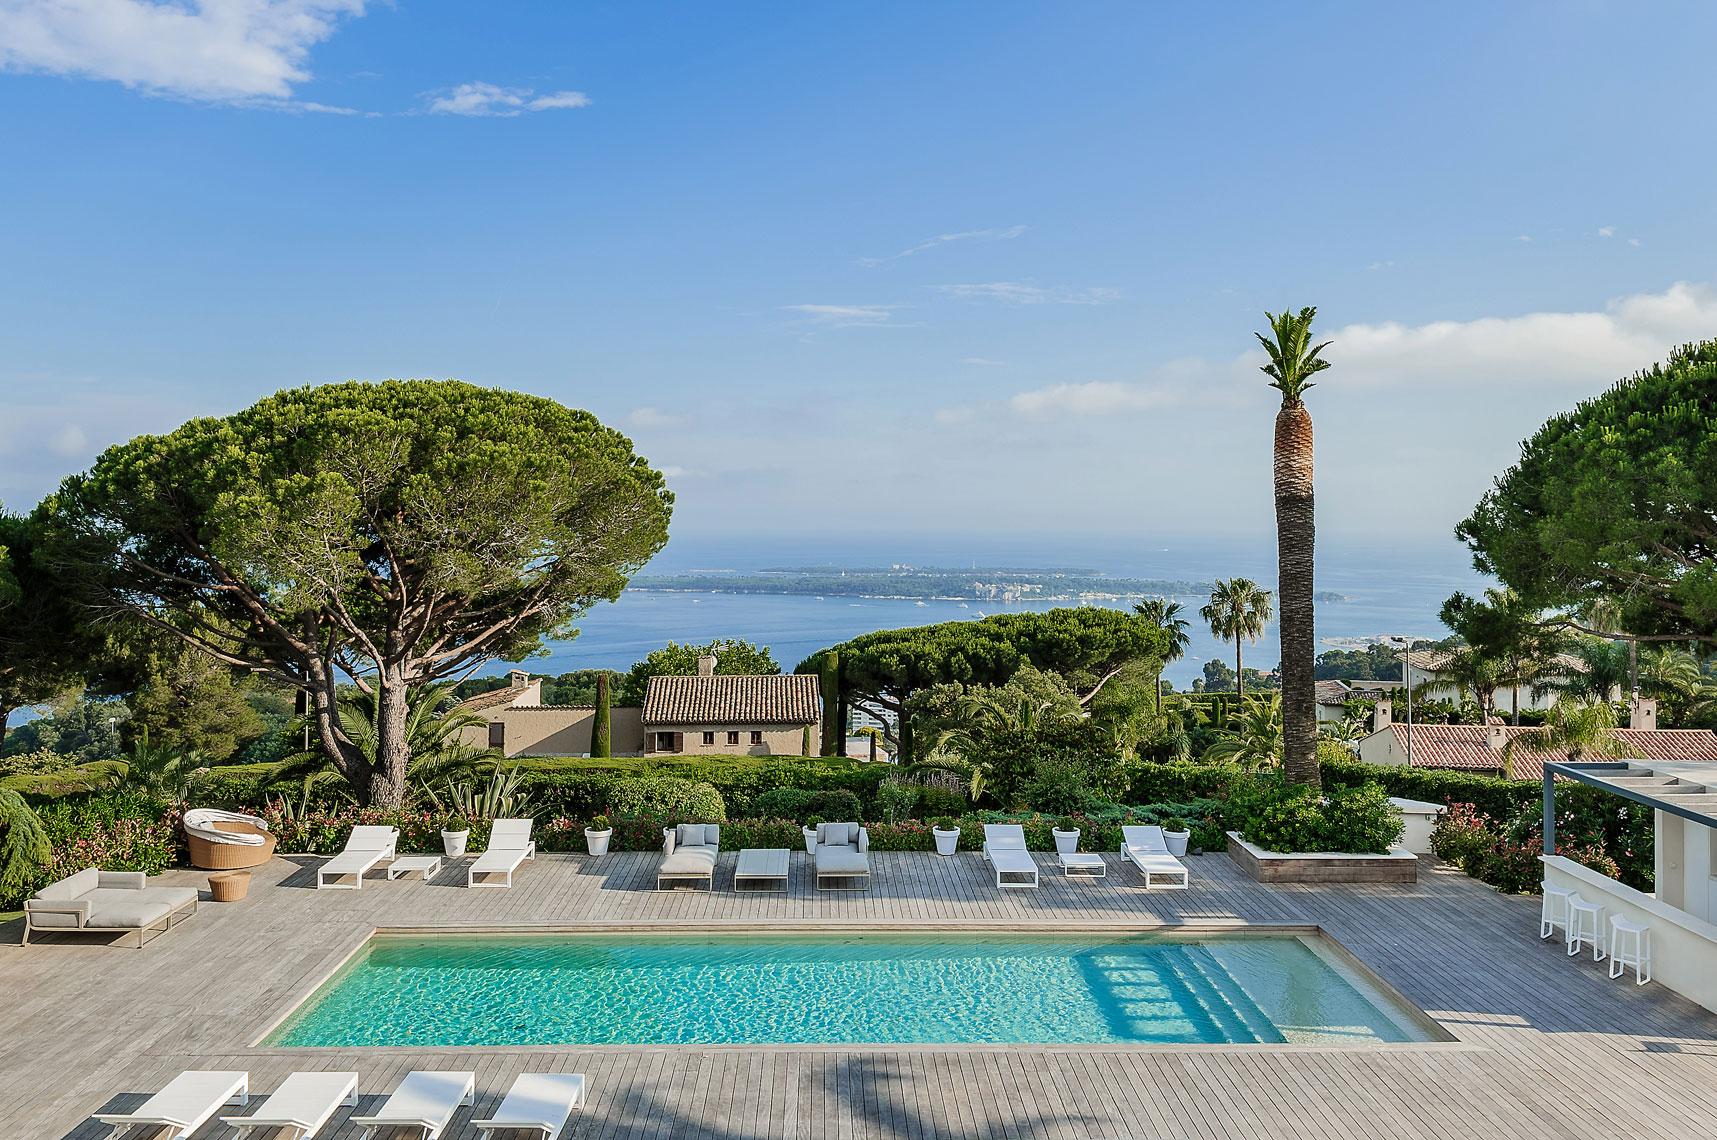 Villa-Cannes---Victor-Perez-Architecture-Photographer-20.jpg